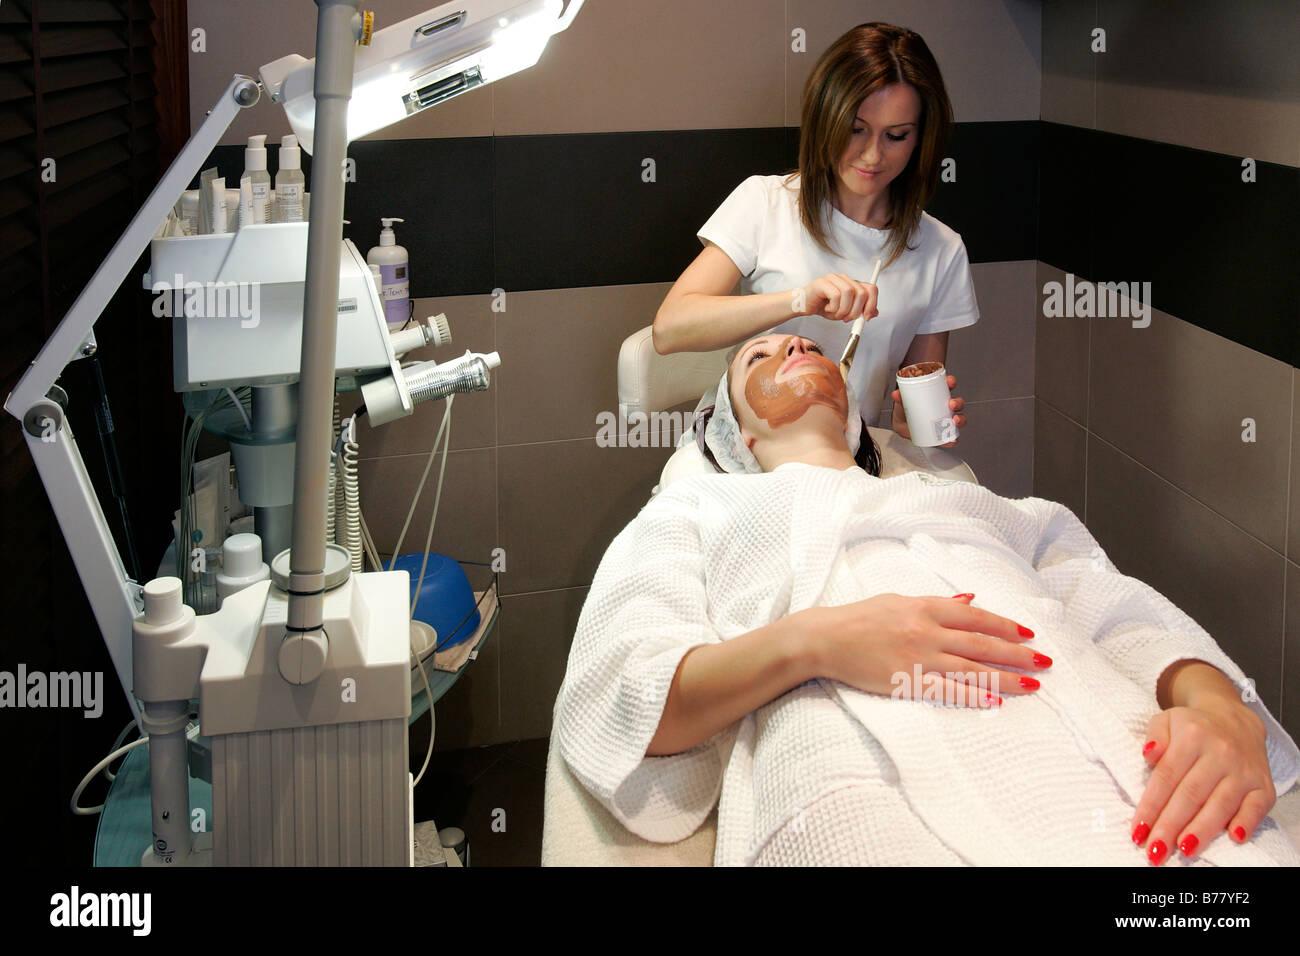 hotel spa water bath Jacuzzi sauna facial treatment relaxing ...